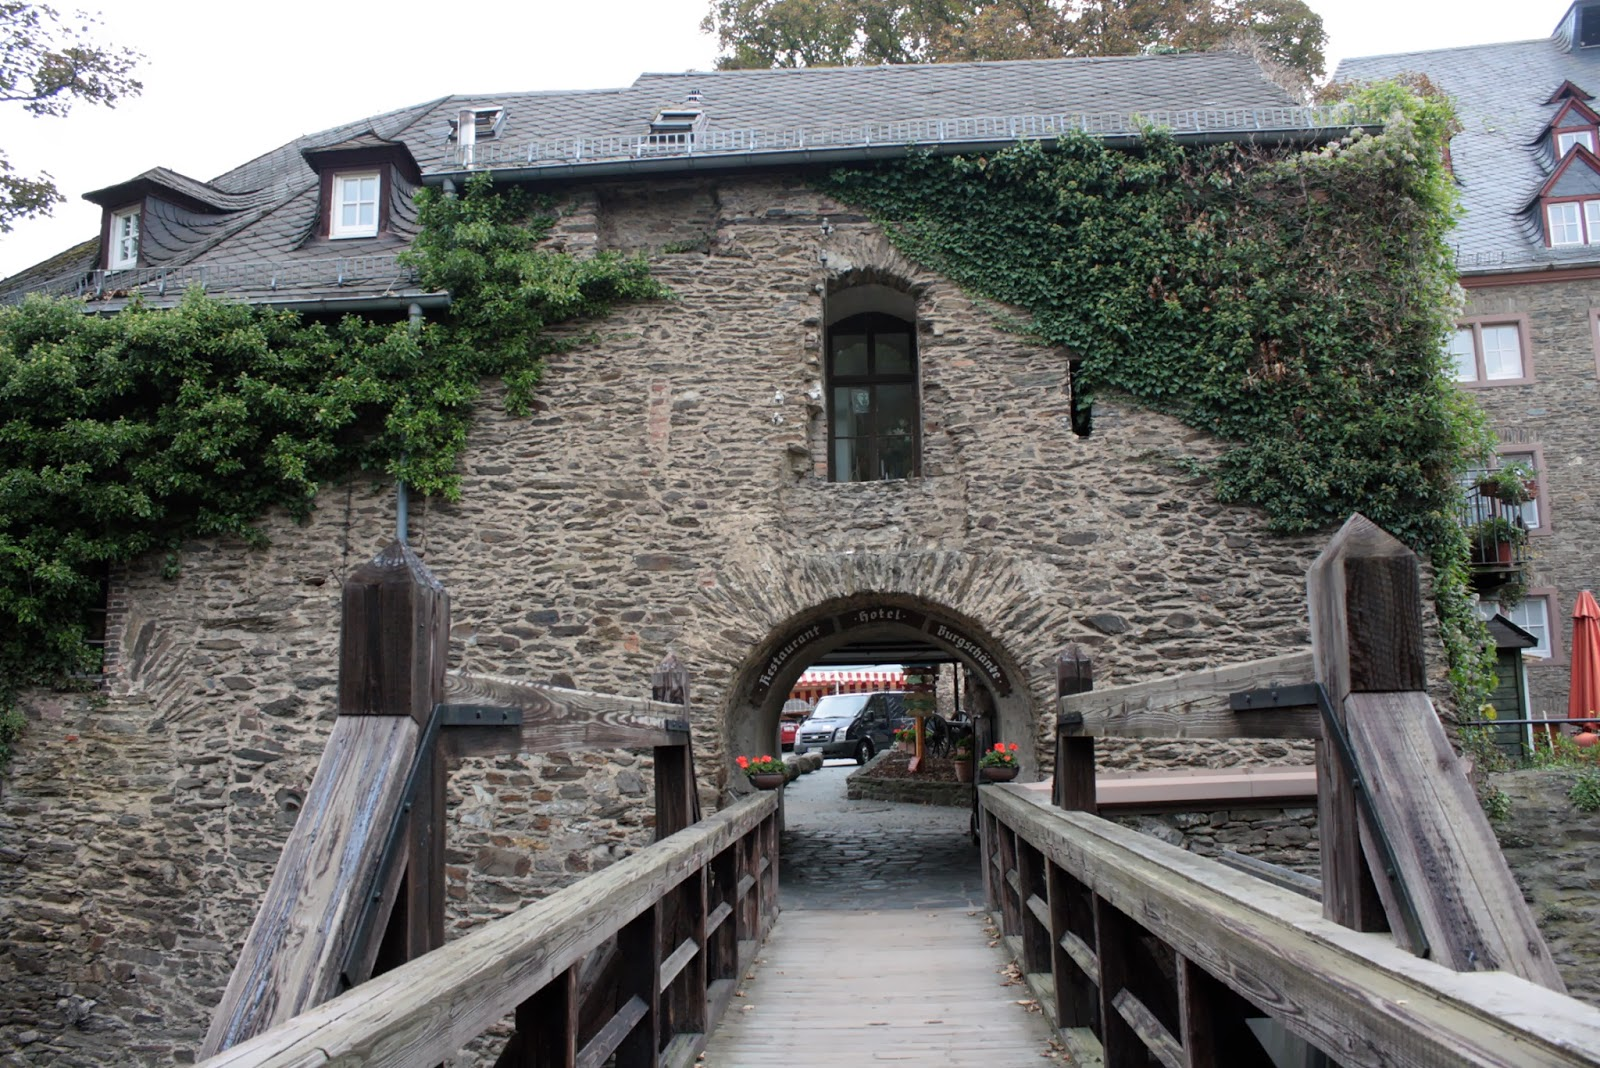 Castle Rheinfels on the Rhine - The Tipsy Terrier blog